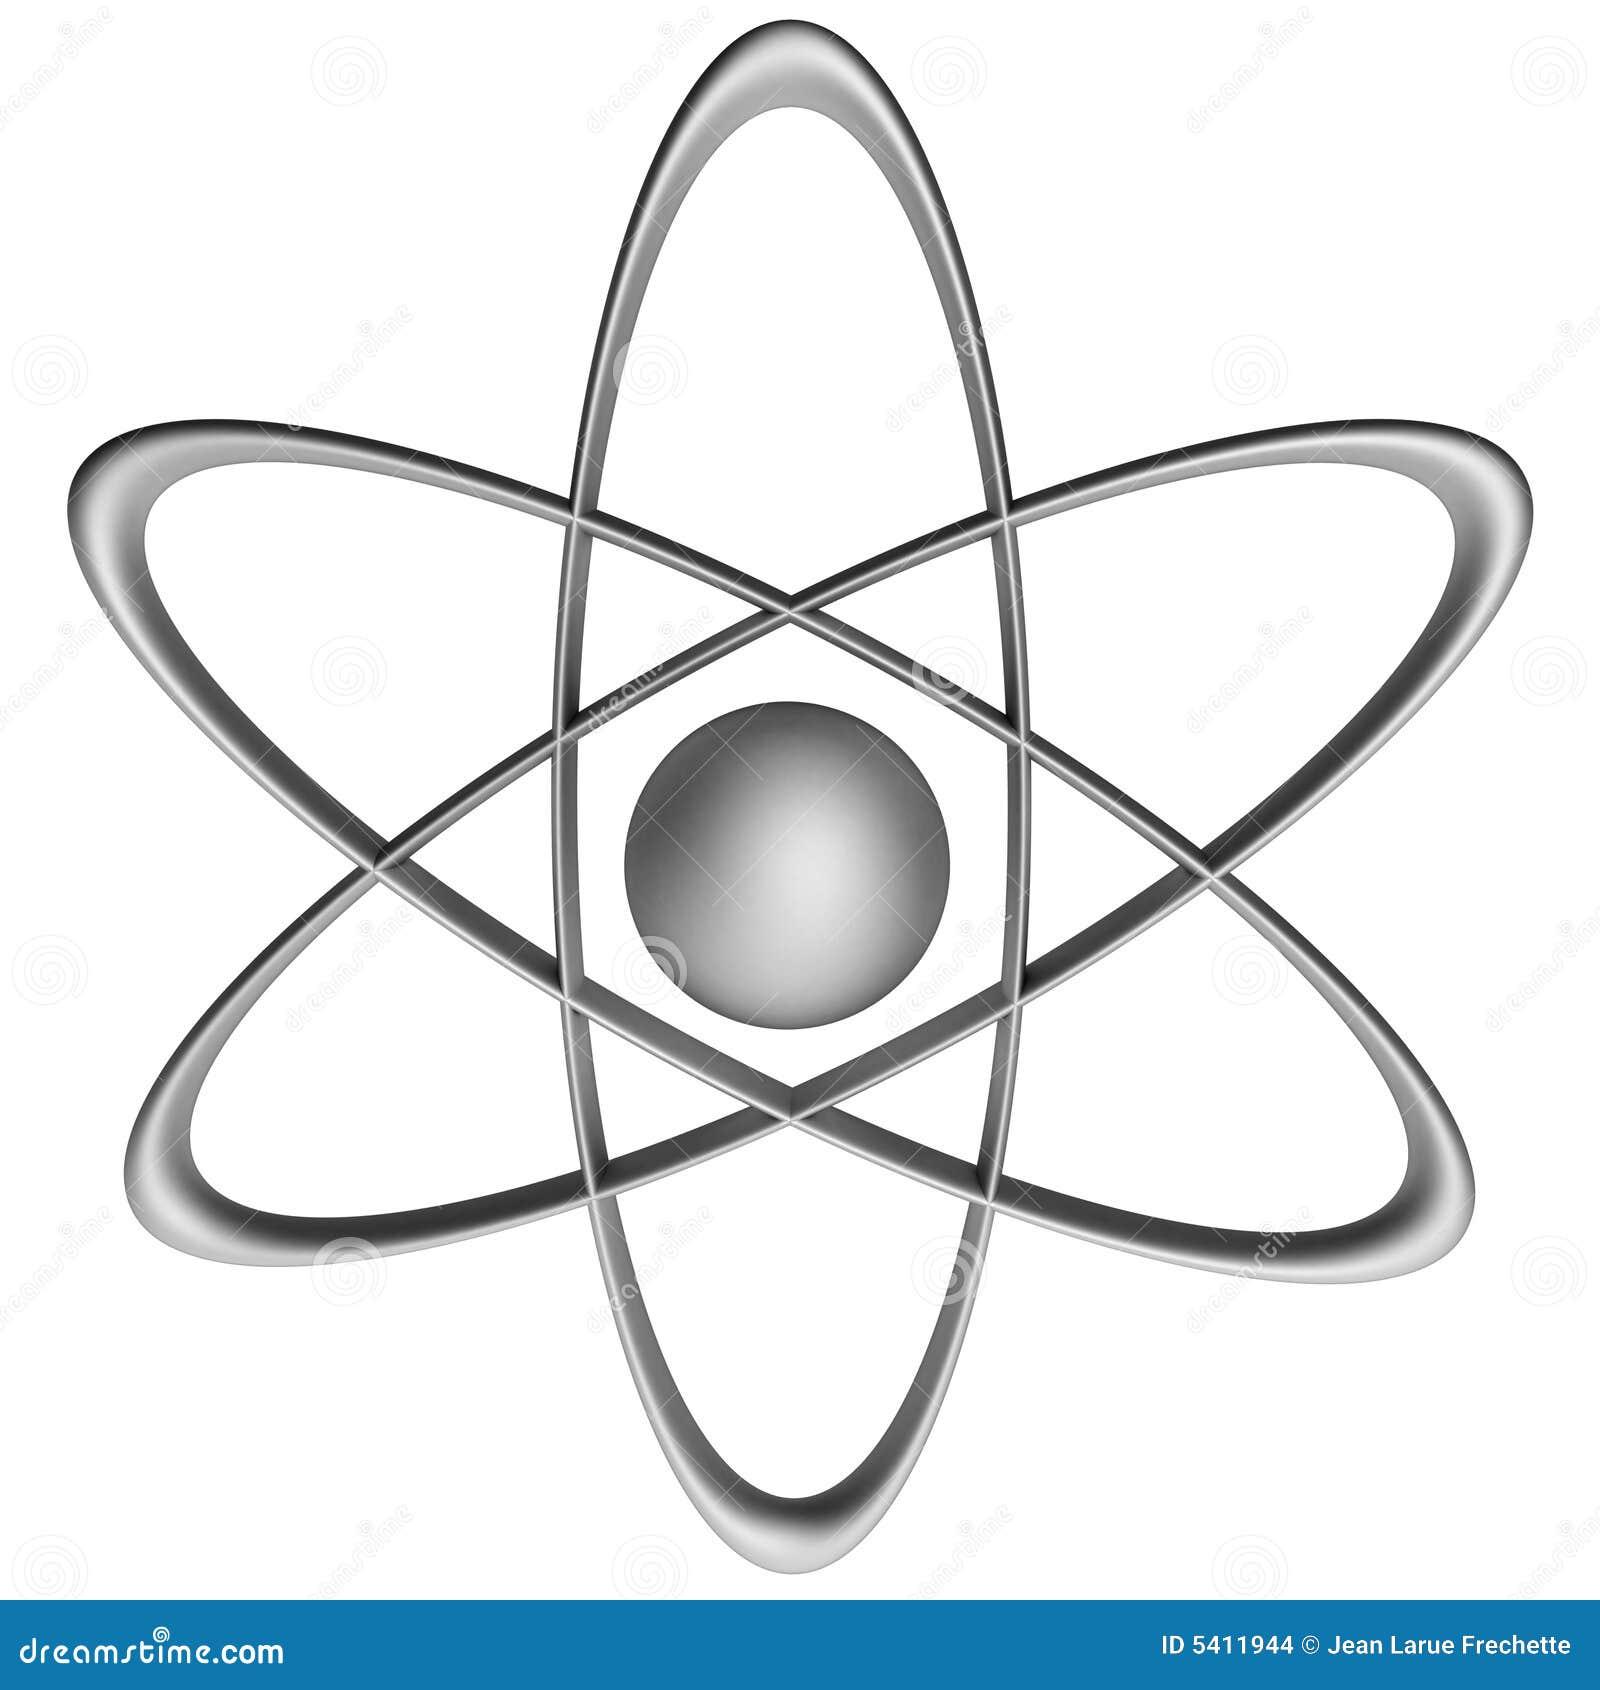 Tomo de aluminio imagenes de archivo imagen 5411944 - Simbolo de aluminio ...